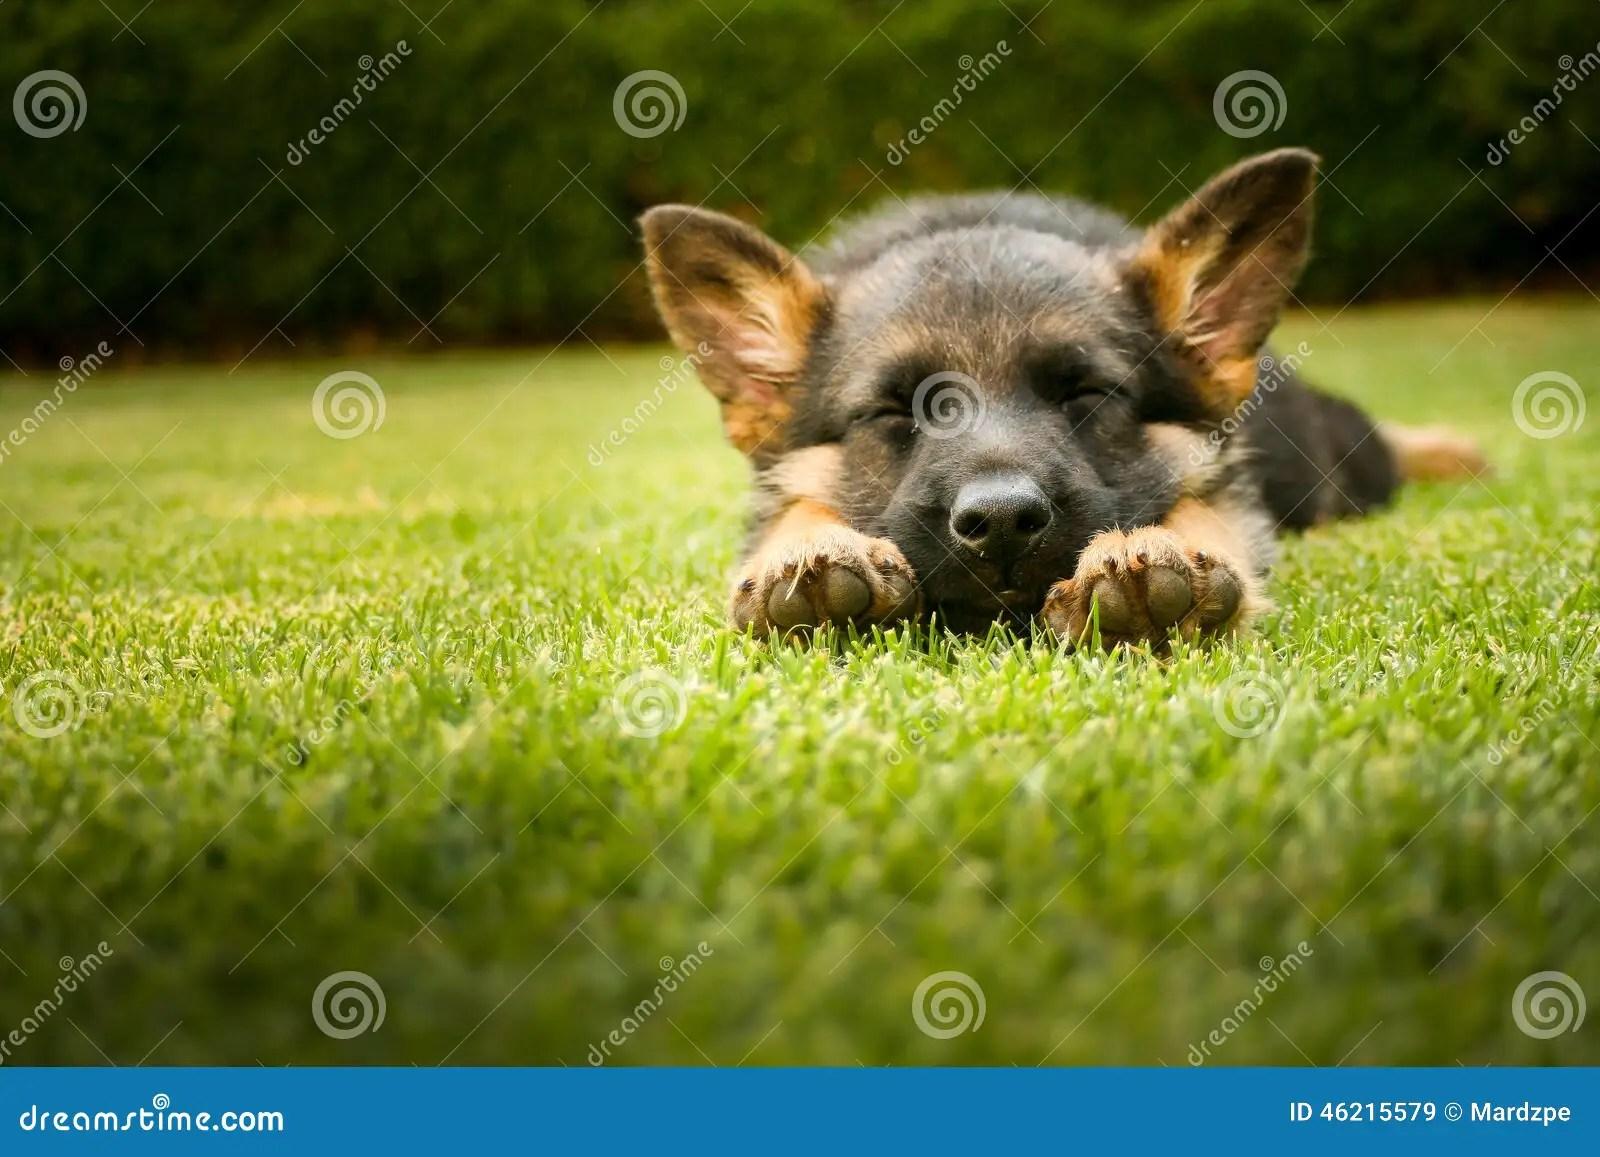 German Shepherd Puppy Sleeping On A Warm Summer Day Stock